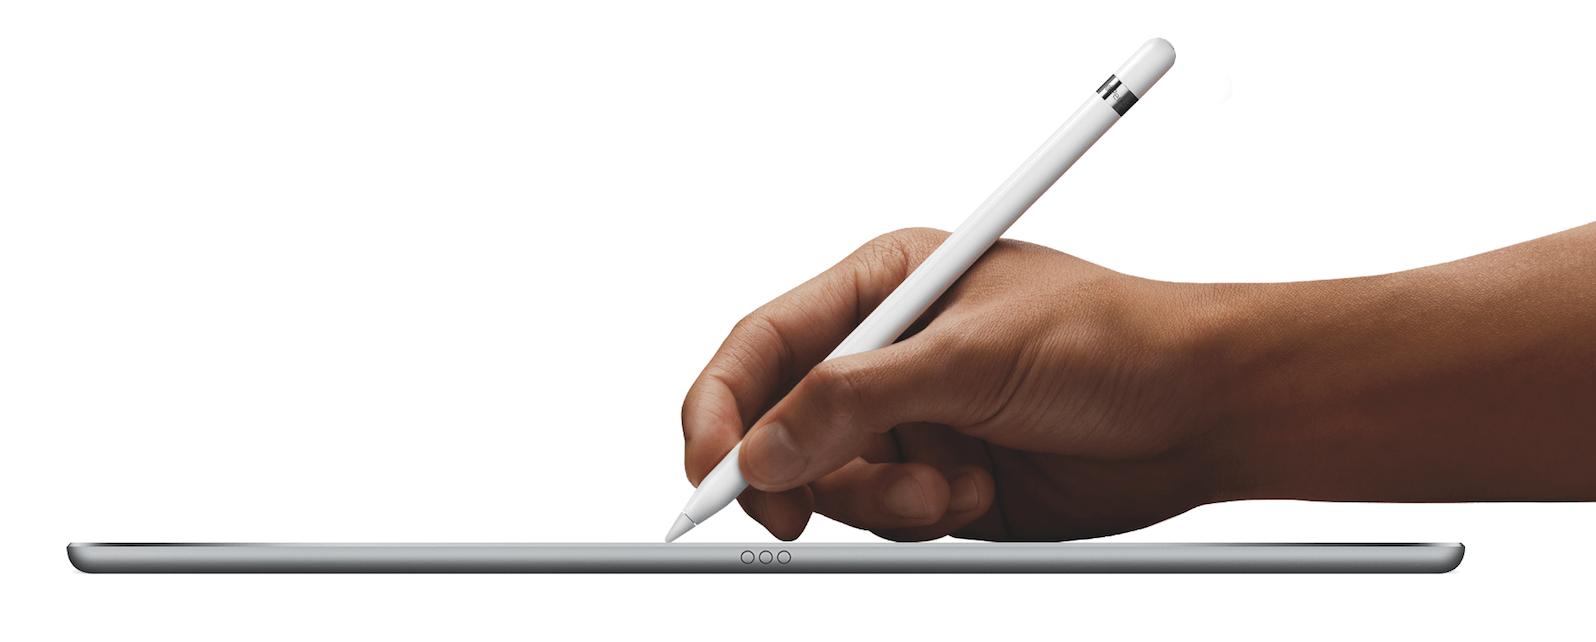 iPad Pro: Das neue Tablet hat 4 GB RAM 1